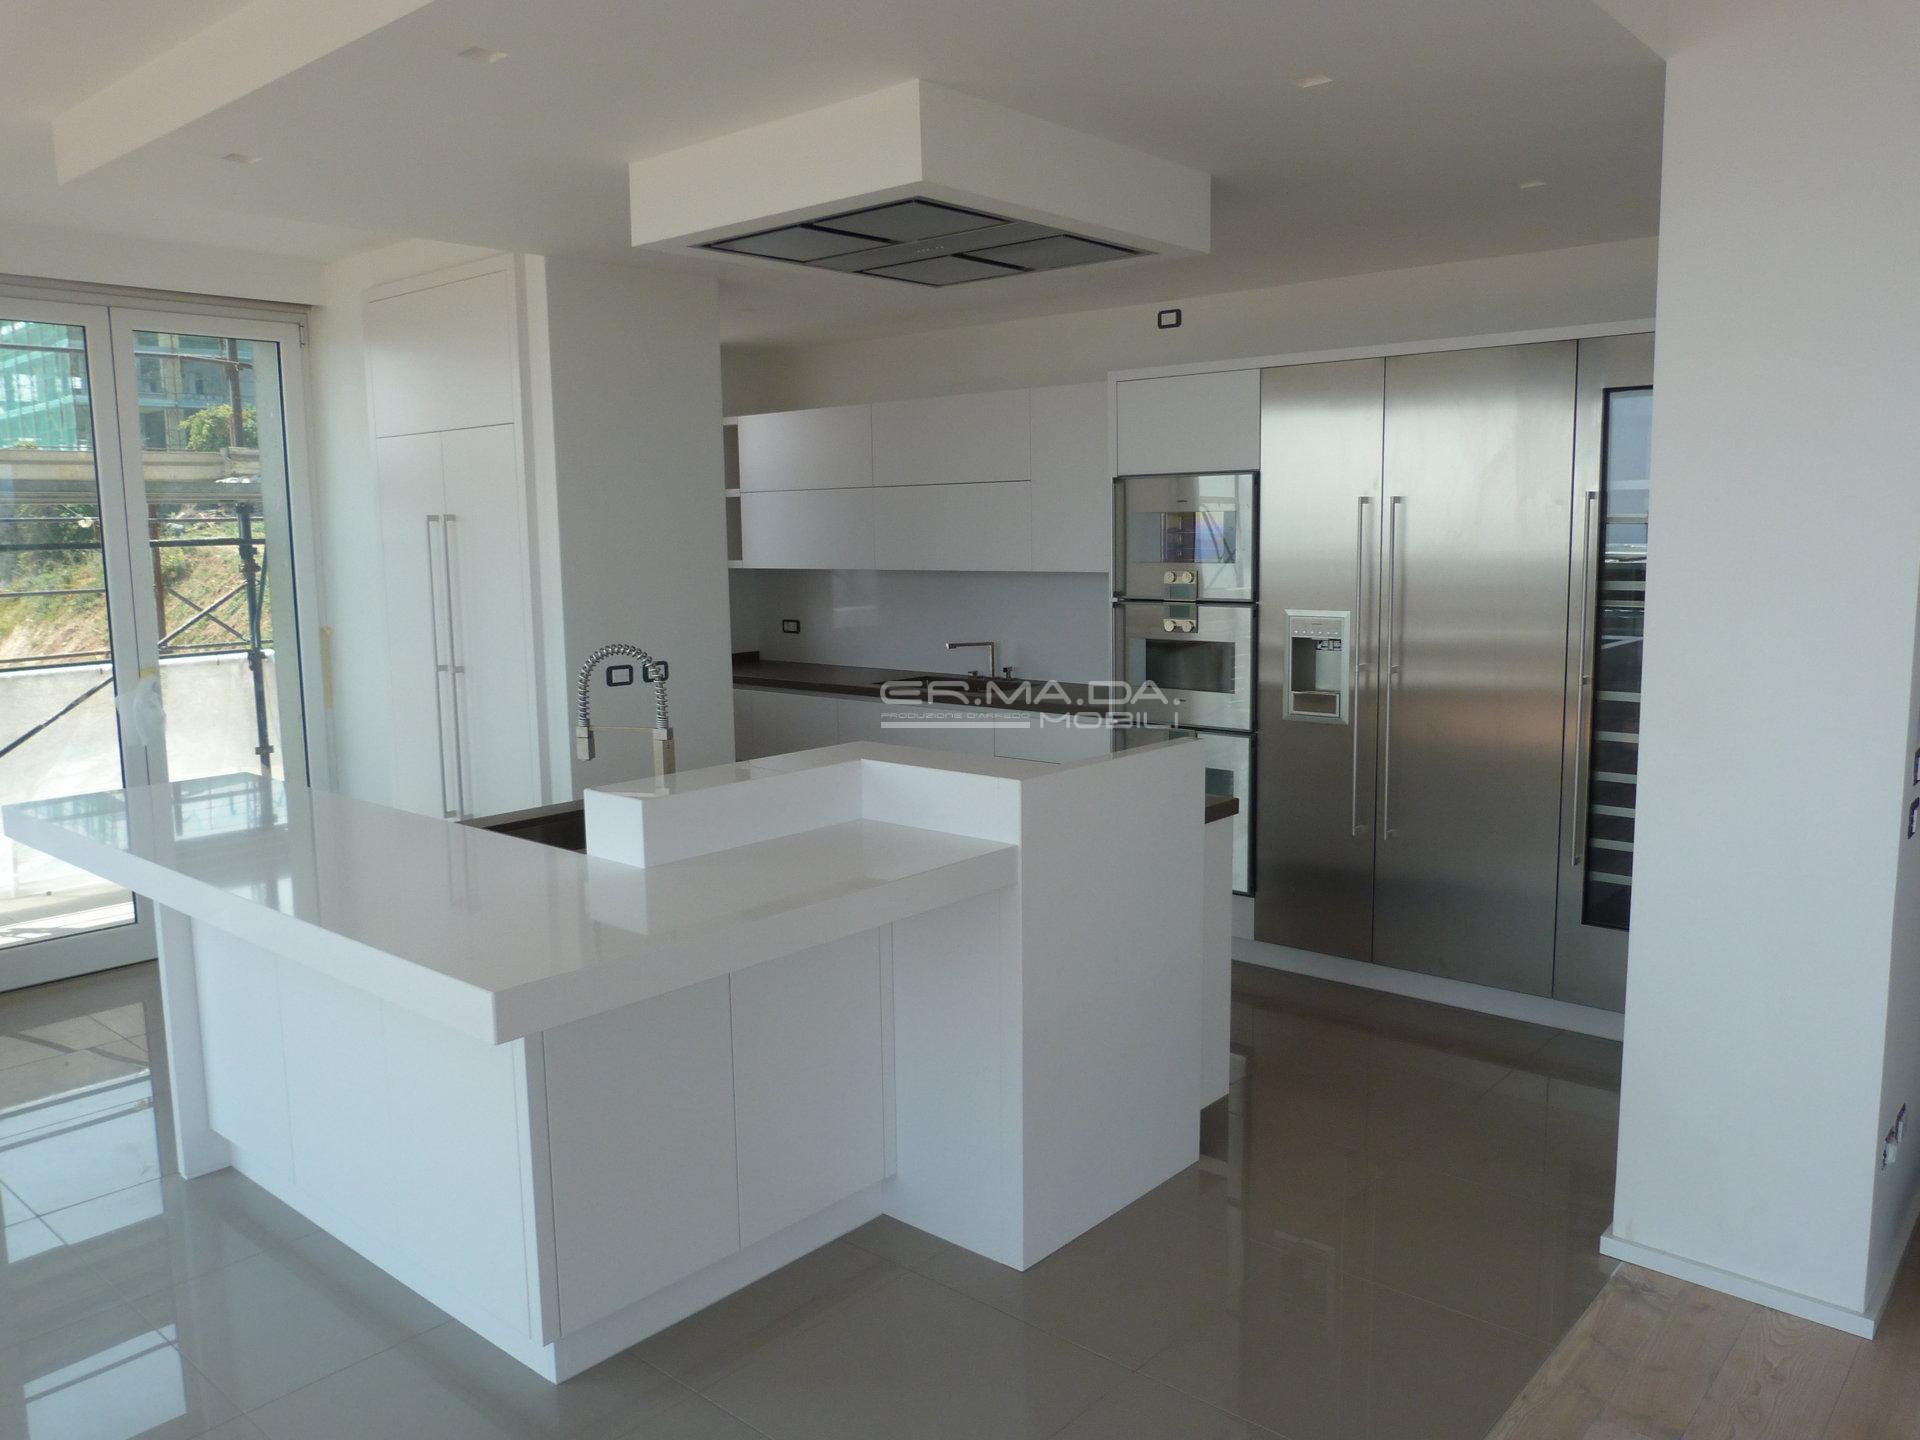 2 Cucina moderna bianco opaco - ER. MA. DA. Mobilificio - Progetta ...